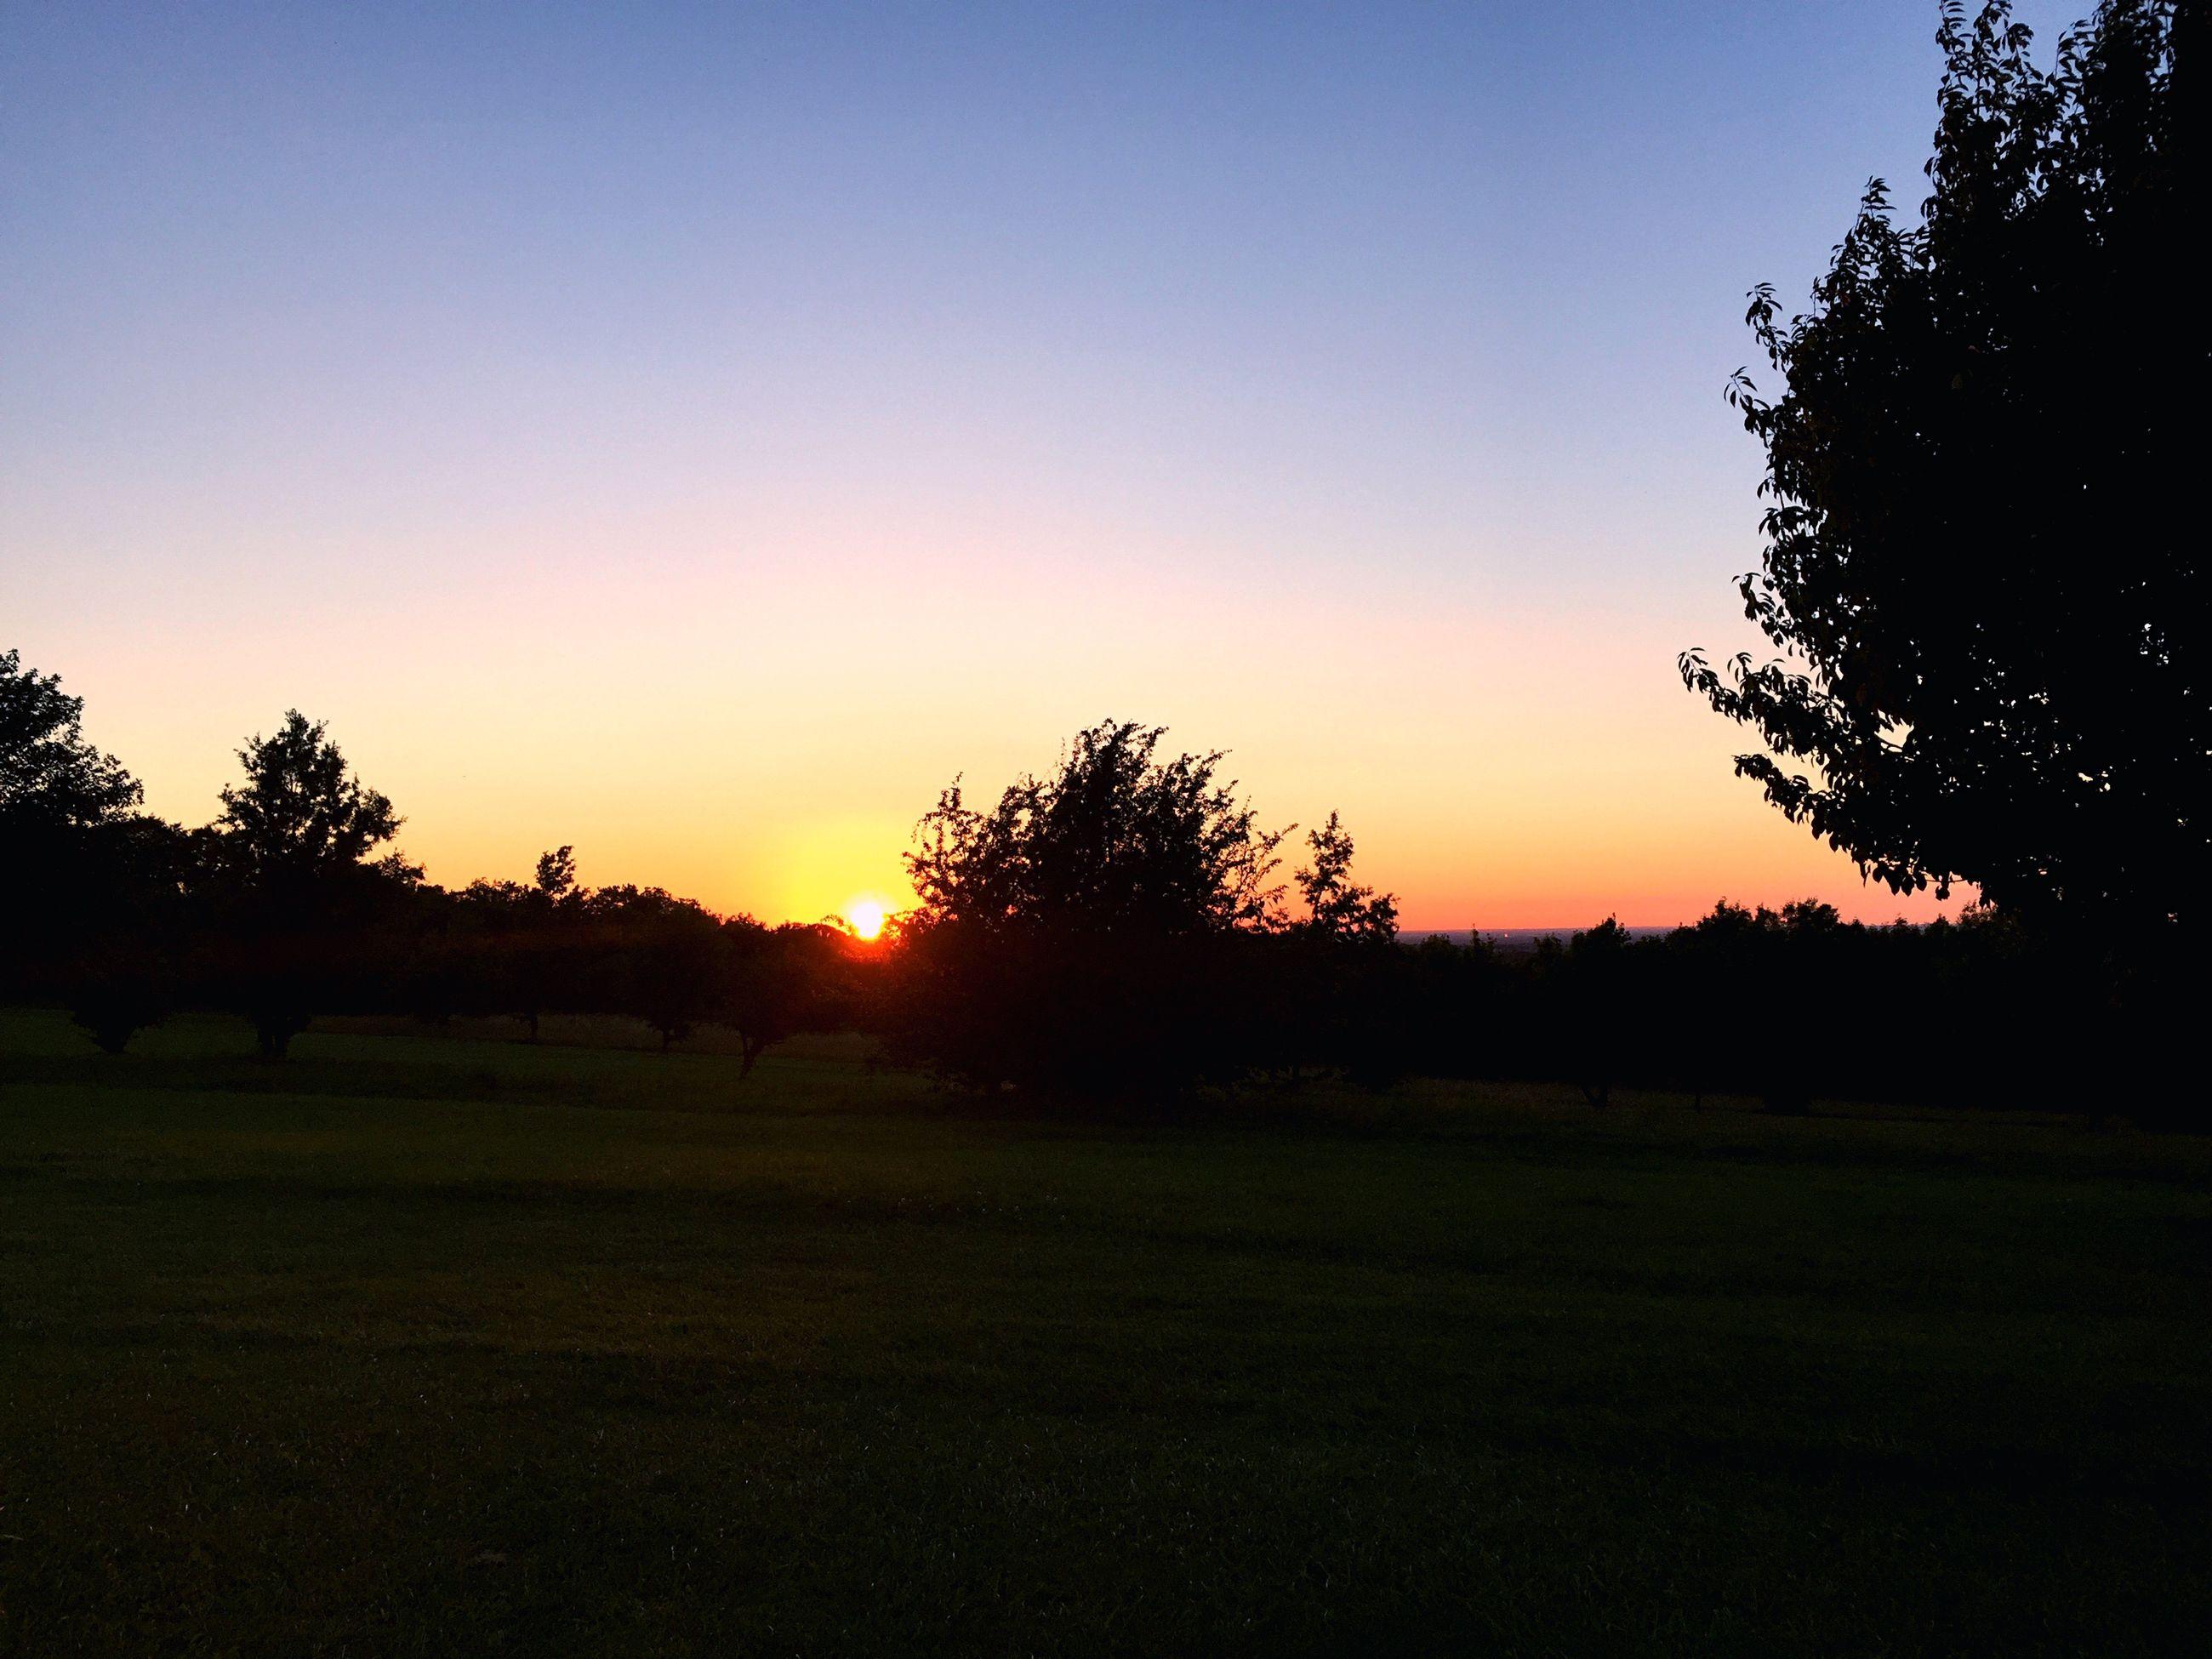 sunset, tranquil scene, tranquility, tree, clear sky, scenics, landscape, beauty in nature, sun, field, nature, orange color, idyllic, growth, sky, grass, non-urban scene, outdoors, no people, non urban scene, remote, blue, dark, outline, majestic, rural scene, horizon over land